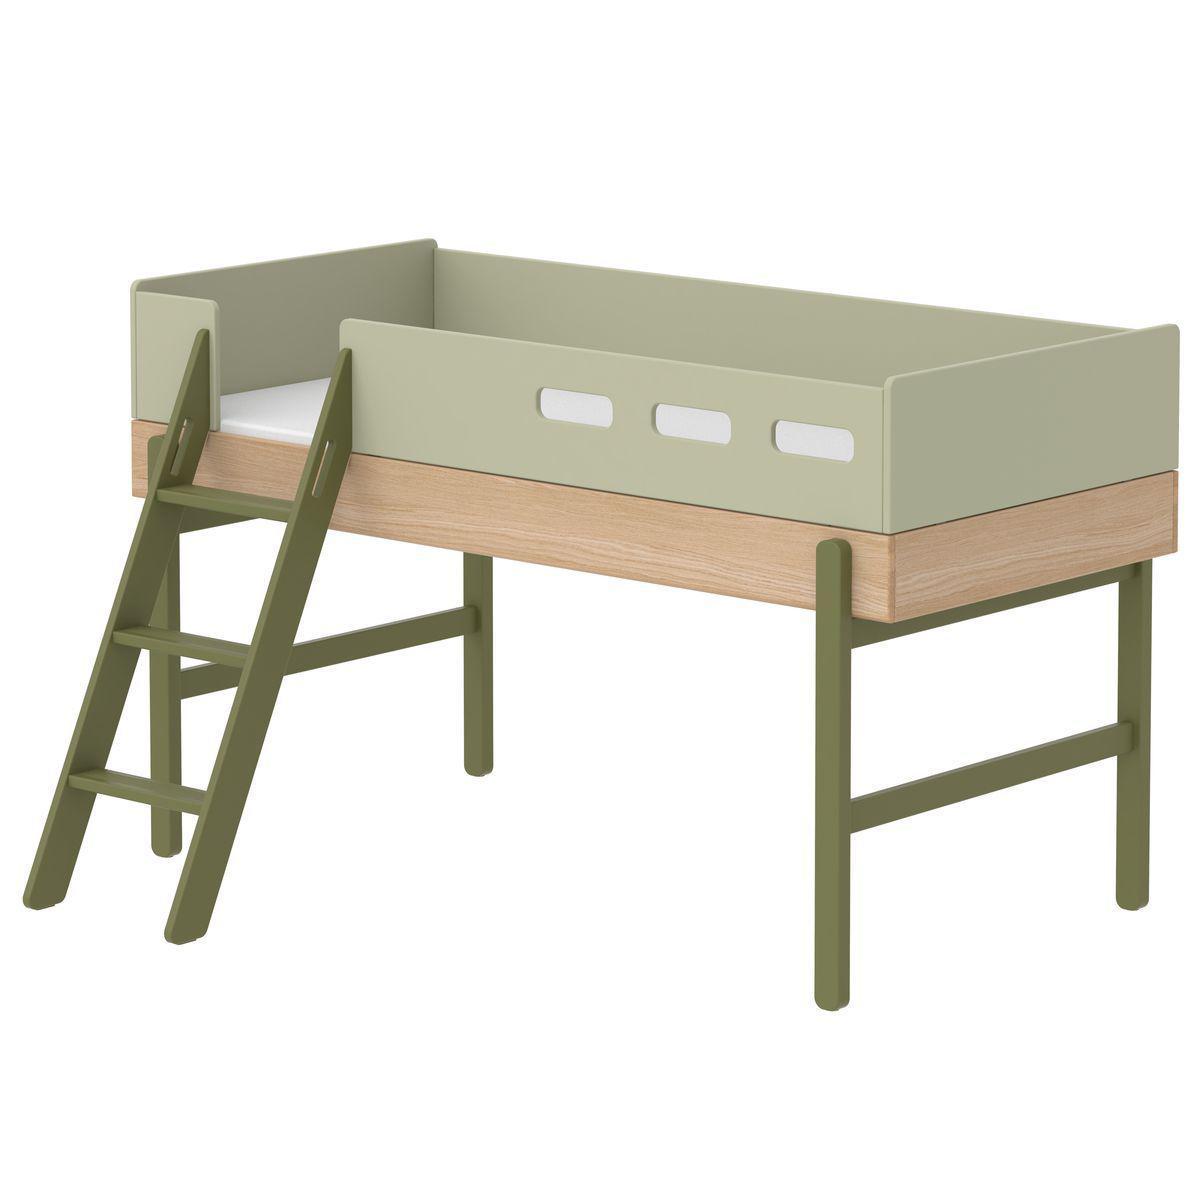 Escalera inclinada cama media alta POPSICLE Flexa kiwi